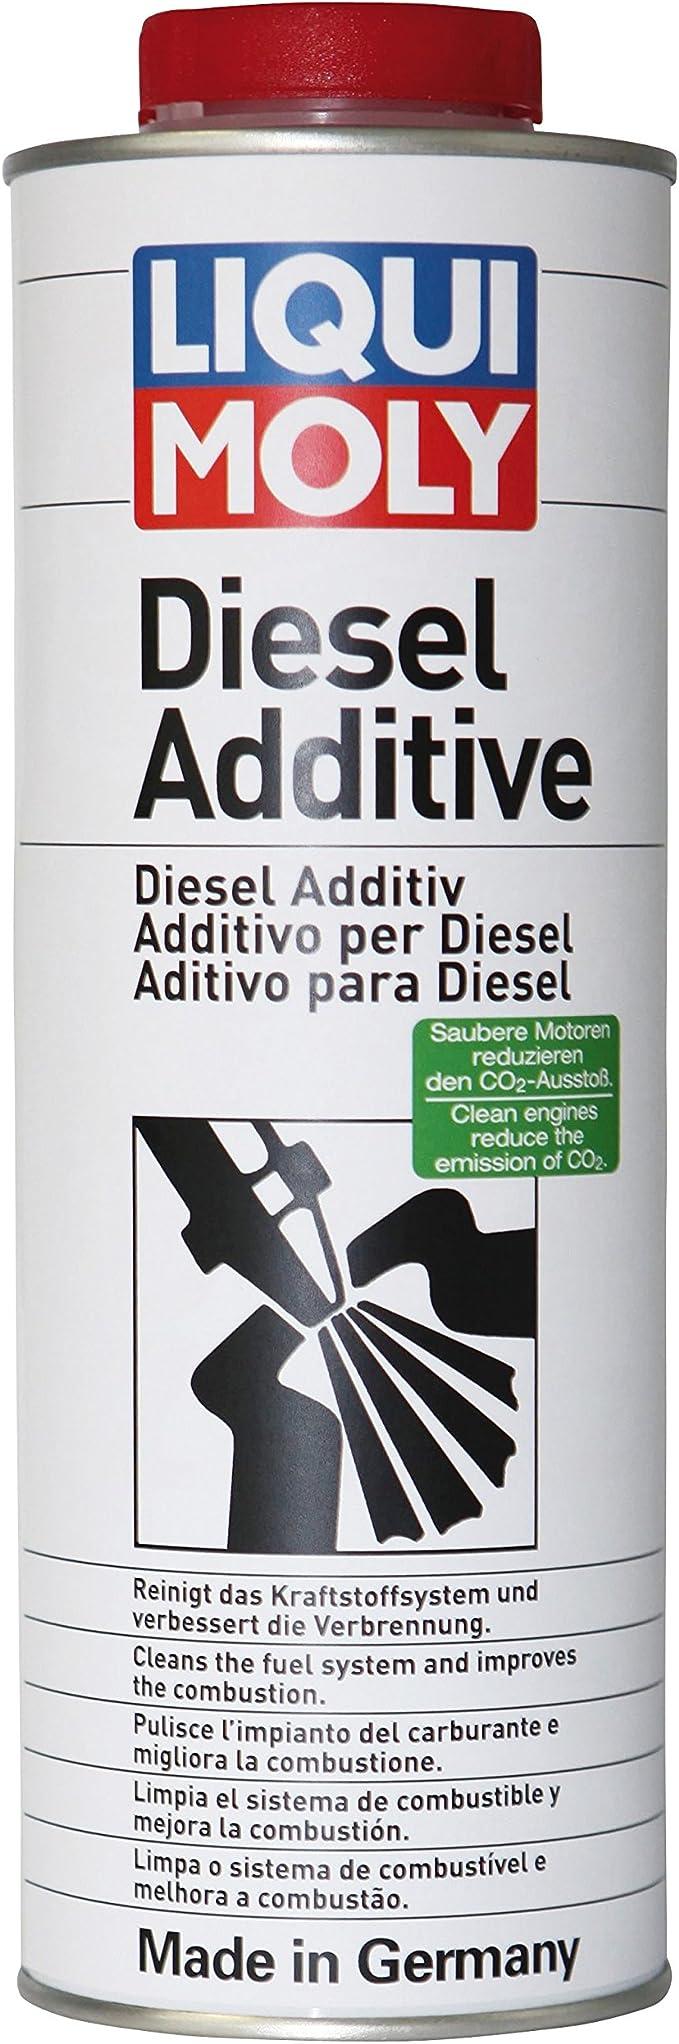 Liqui Moly 2511 Diesel Additiv Auto